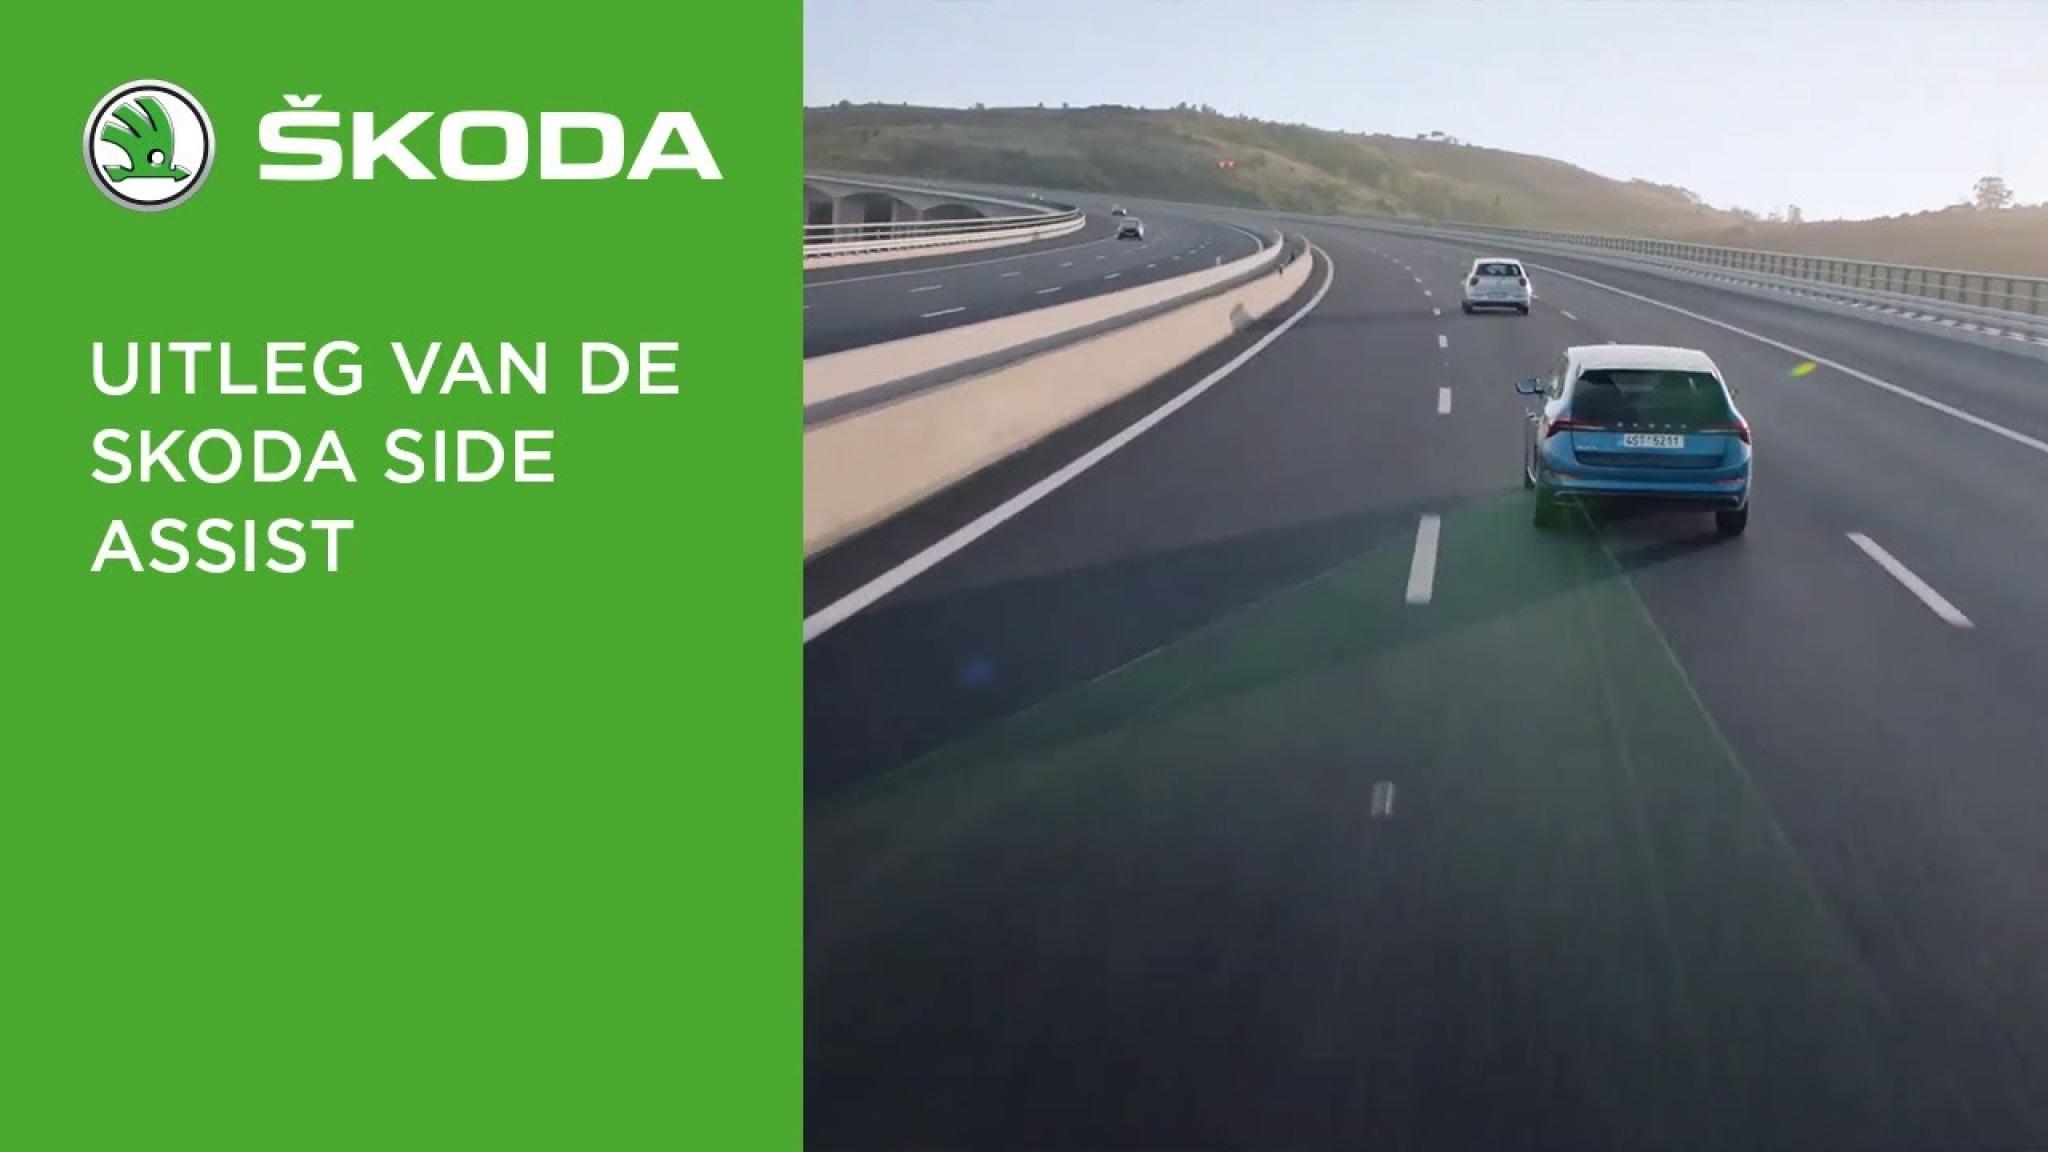 Skoda Side Assist-2021-02-01 17:09:10